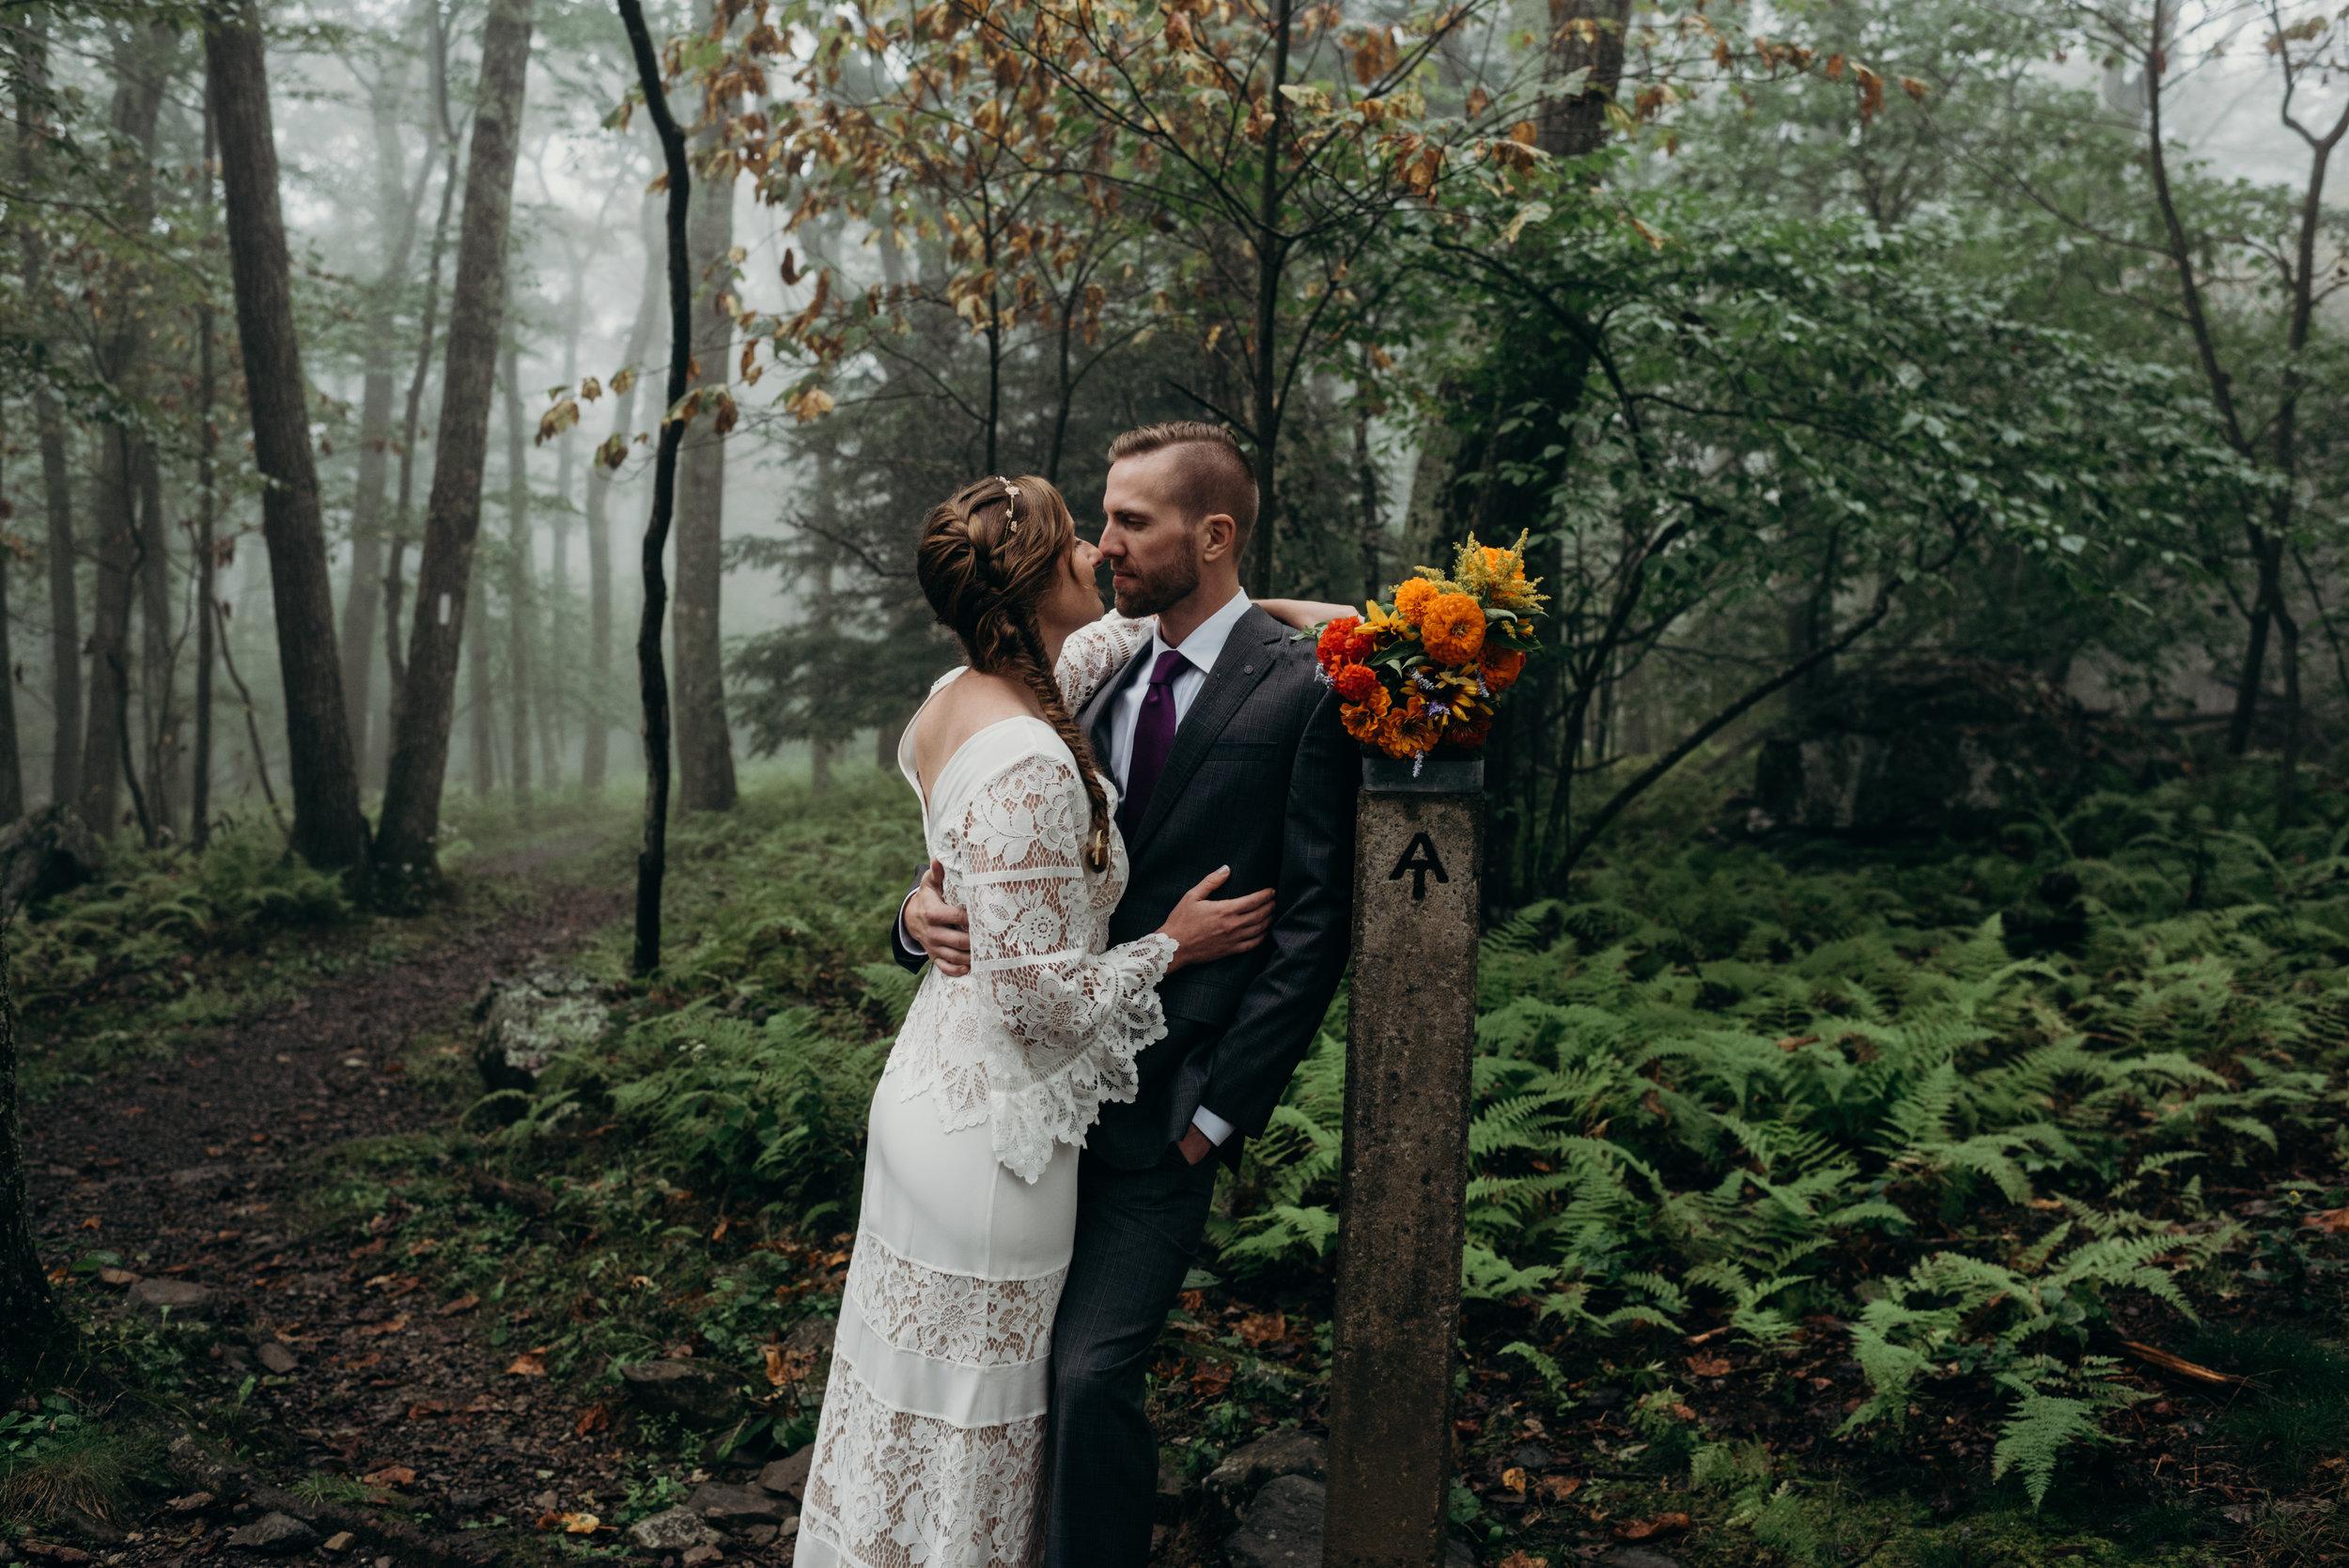 skyland-shenandoah-national-park-wedding-elopement-photographer